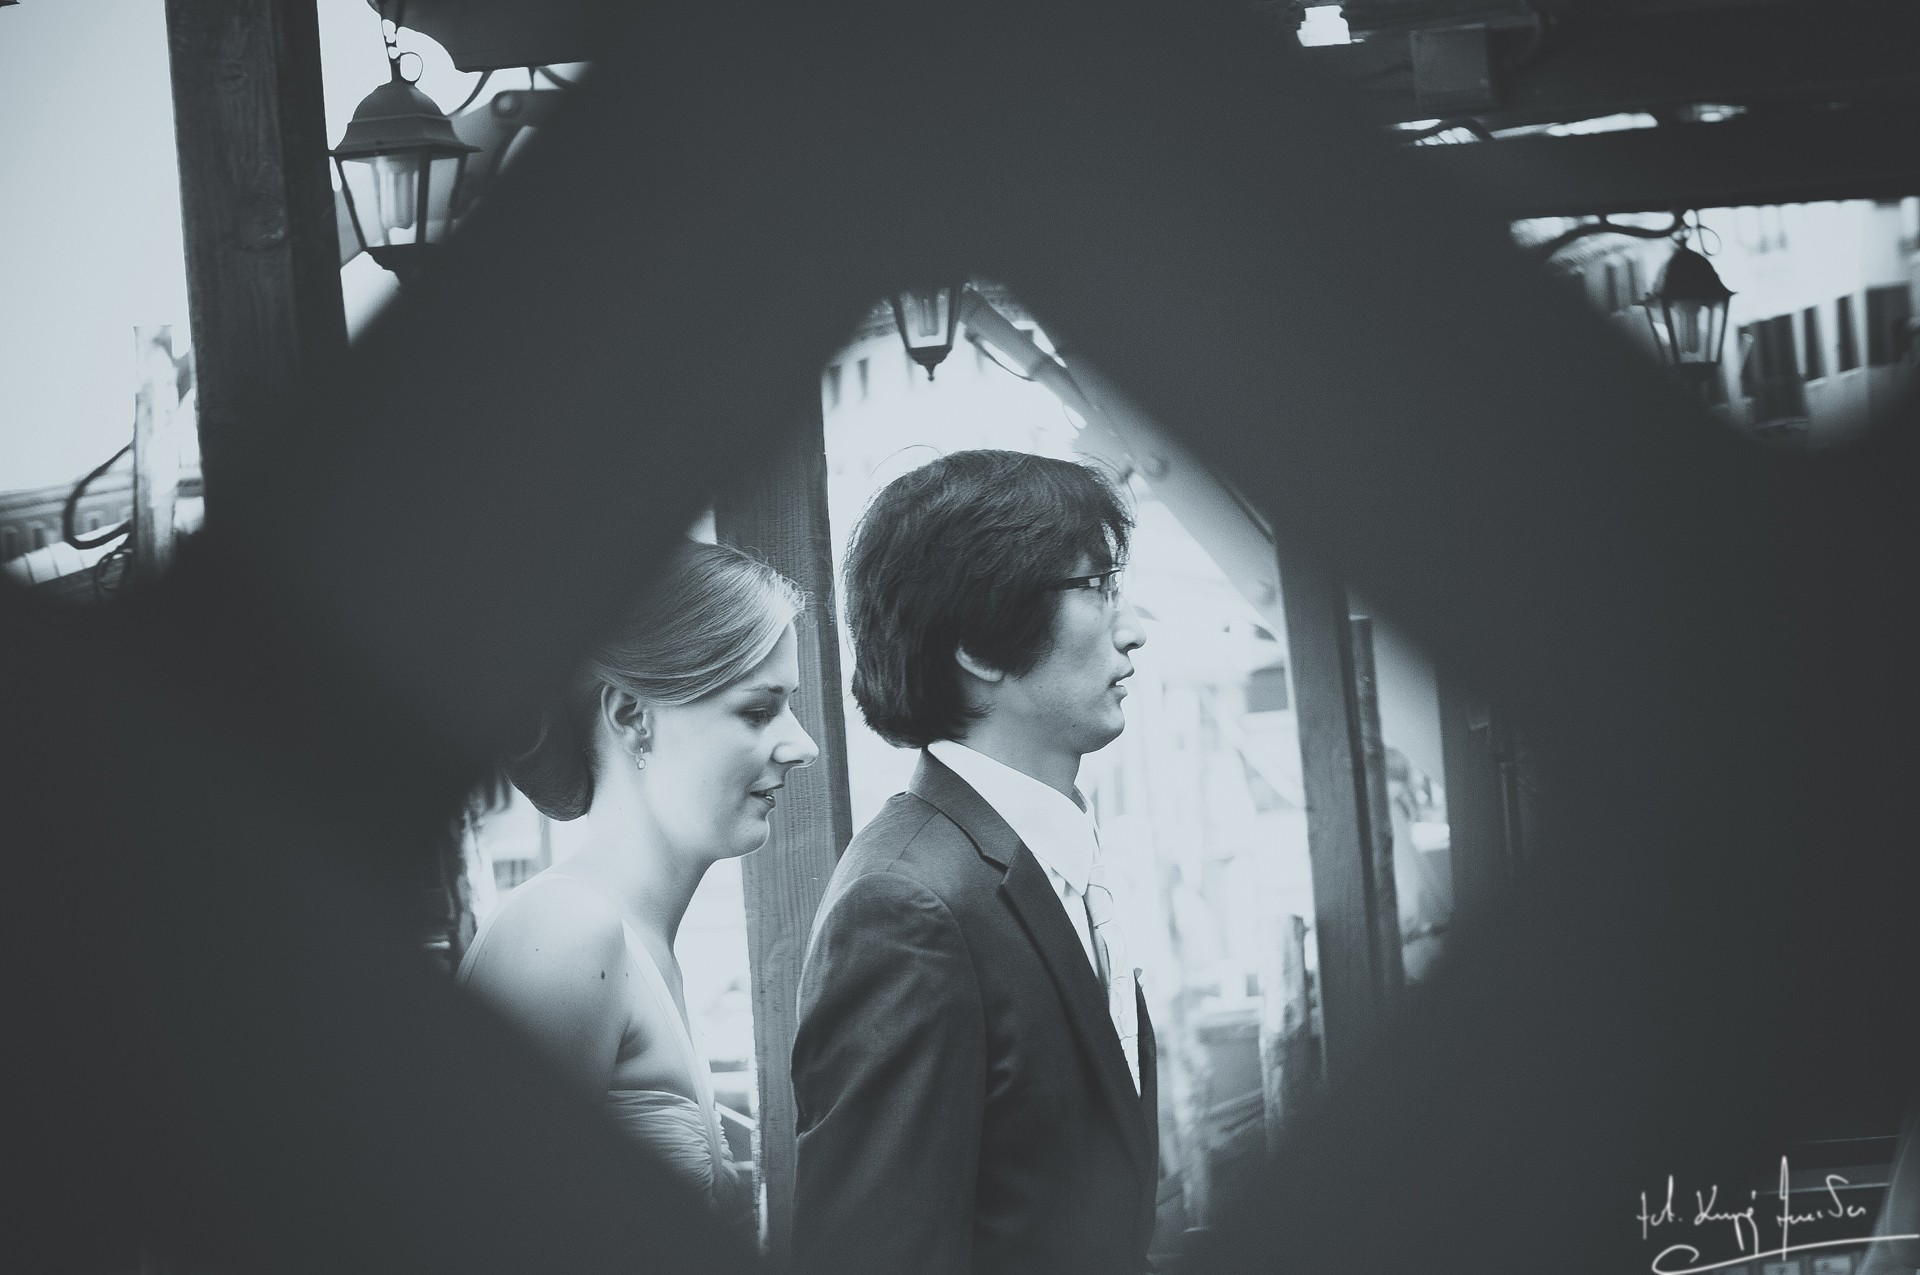 Ślub w wenecji 18 Manuela Luiza & Young Seon Song